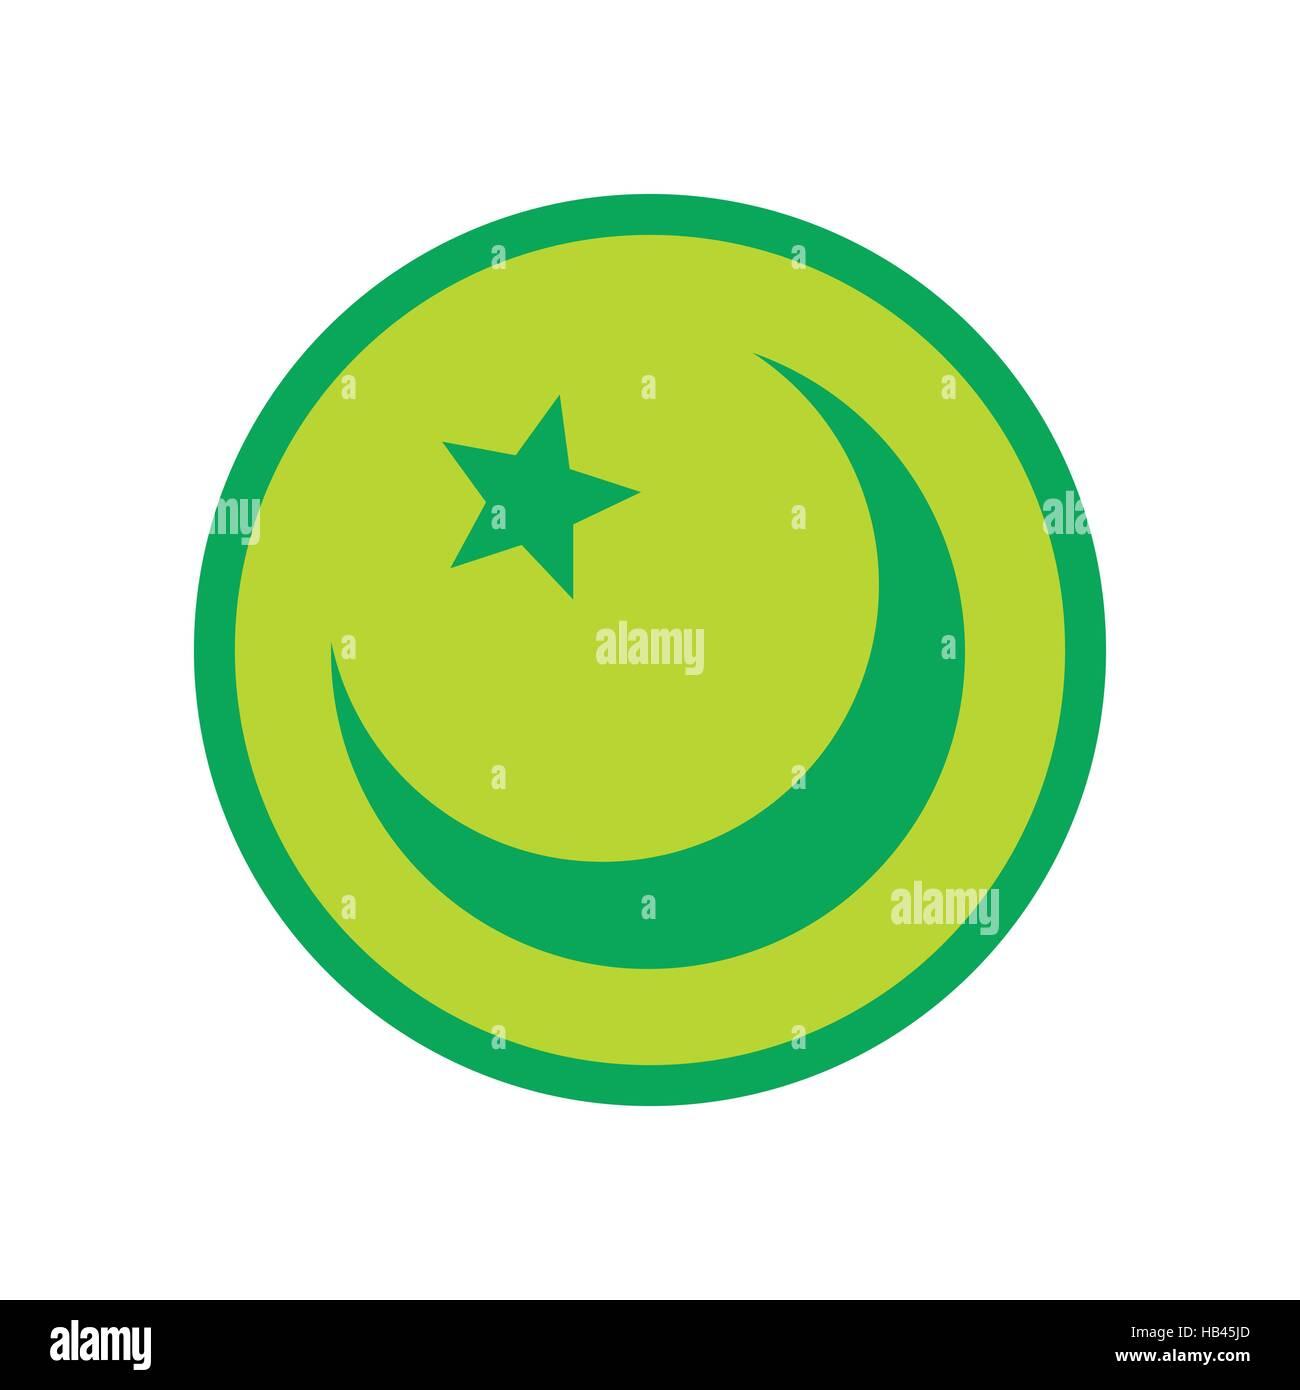 Islam Symbol Flat Icon Stock Vector Art Illustration Vector Image